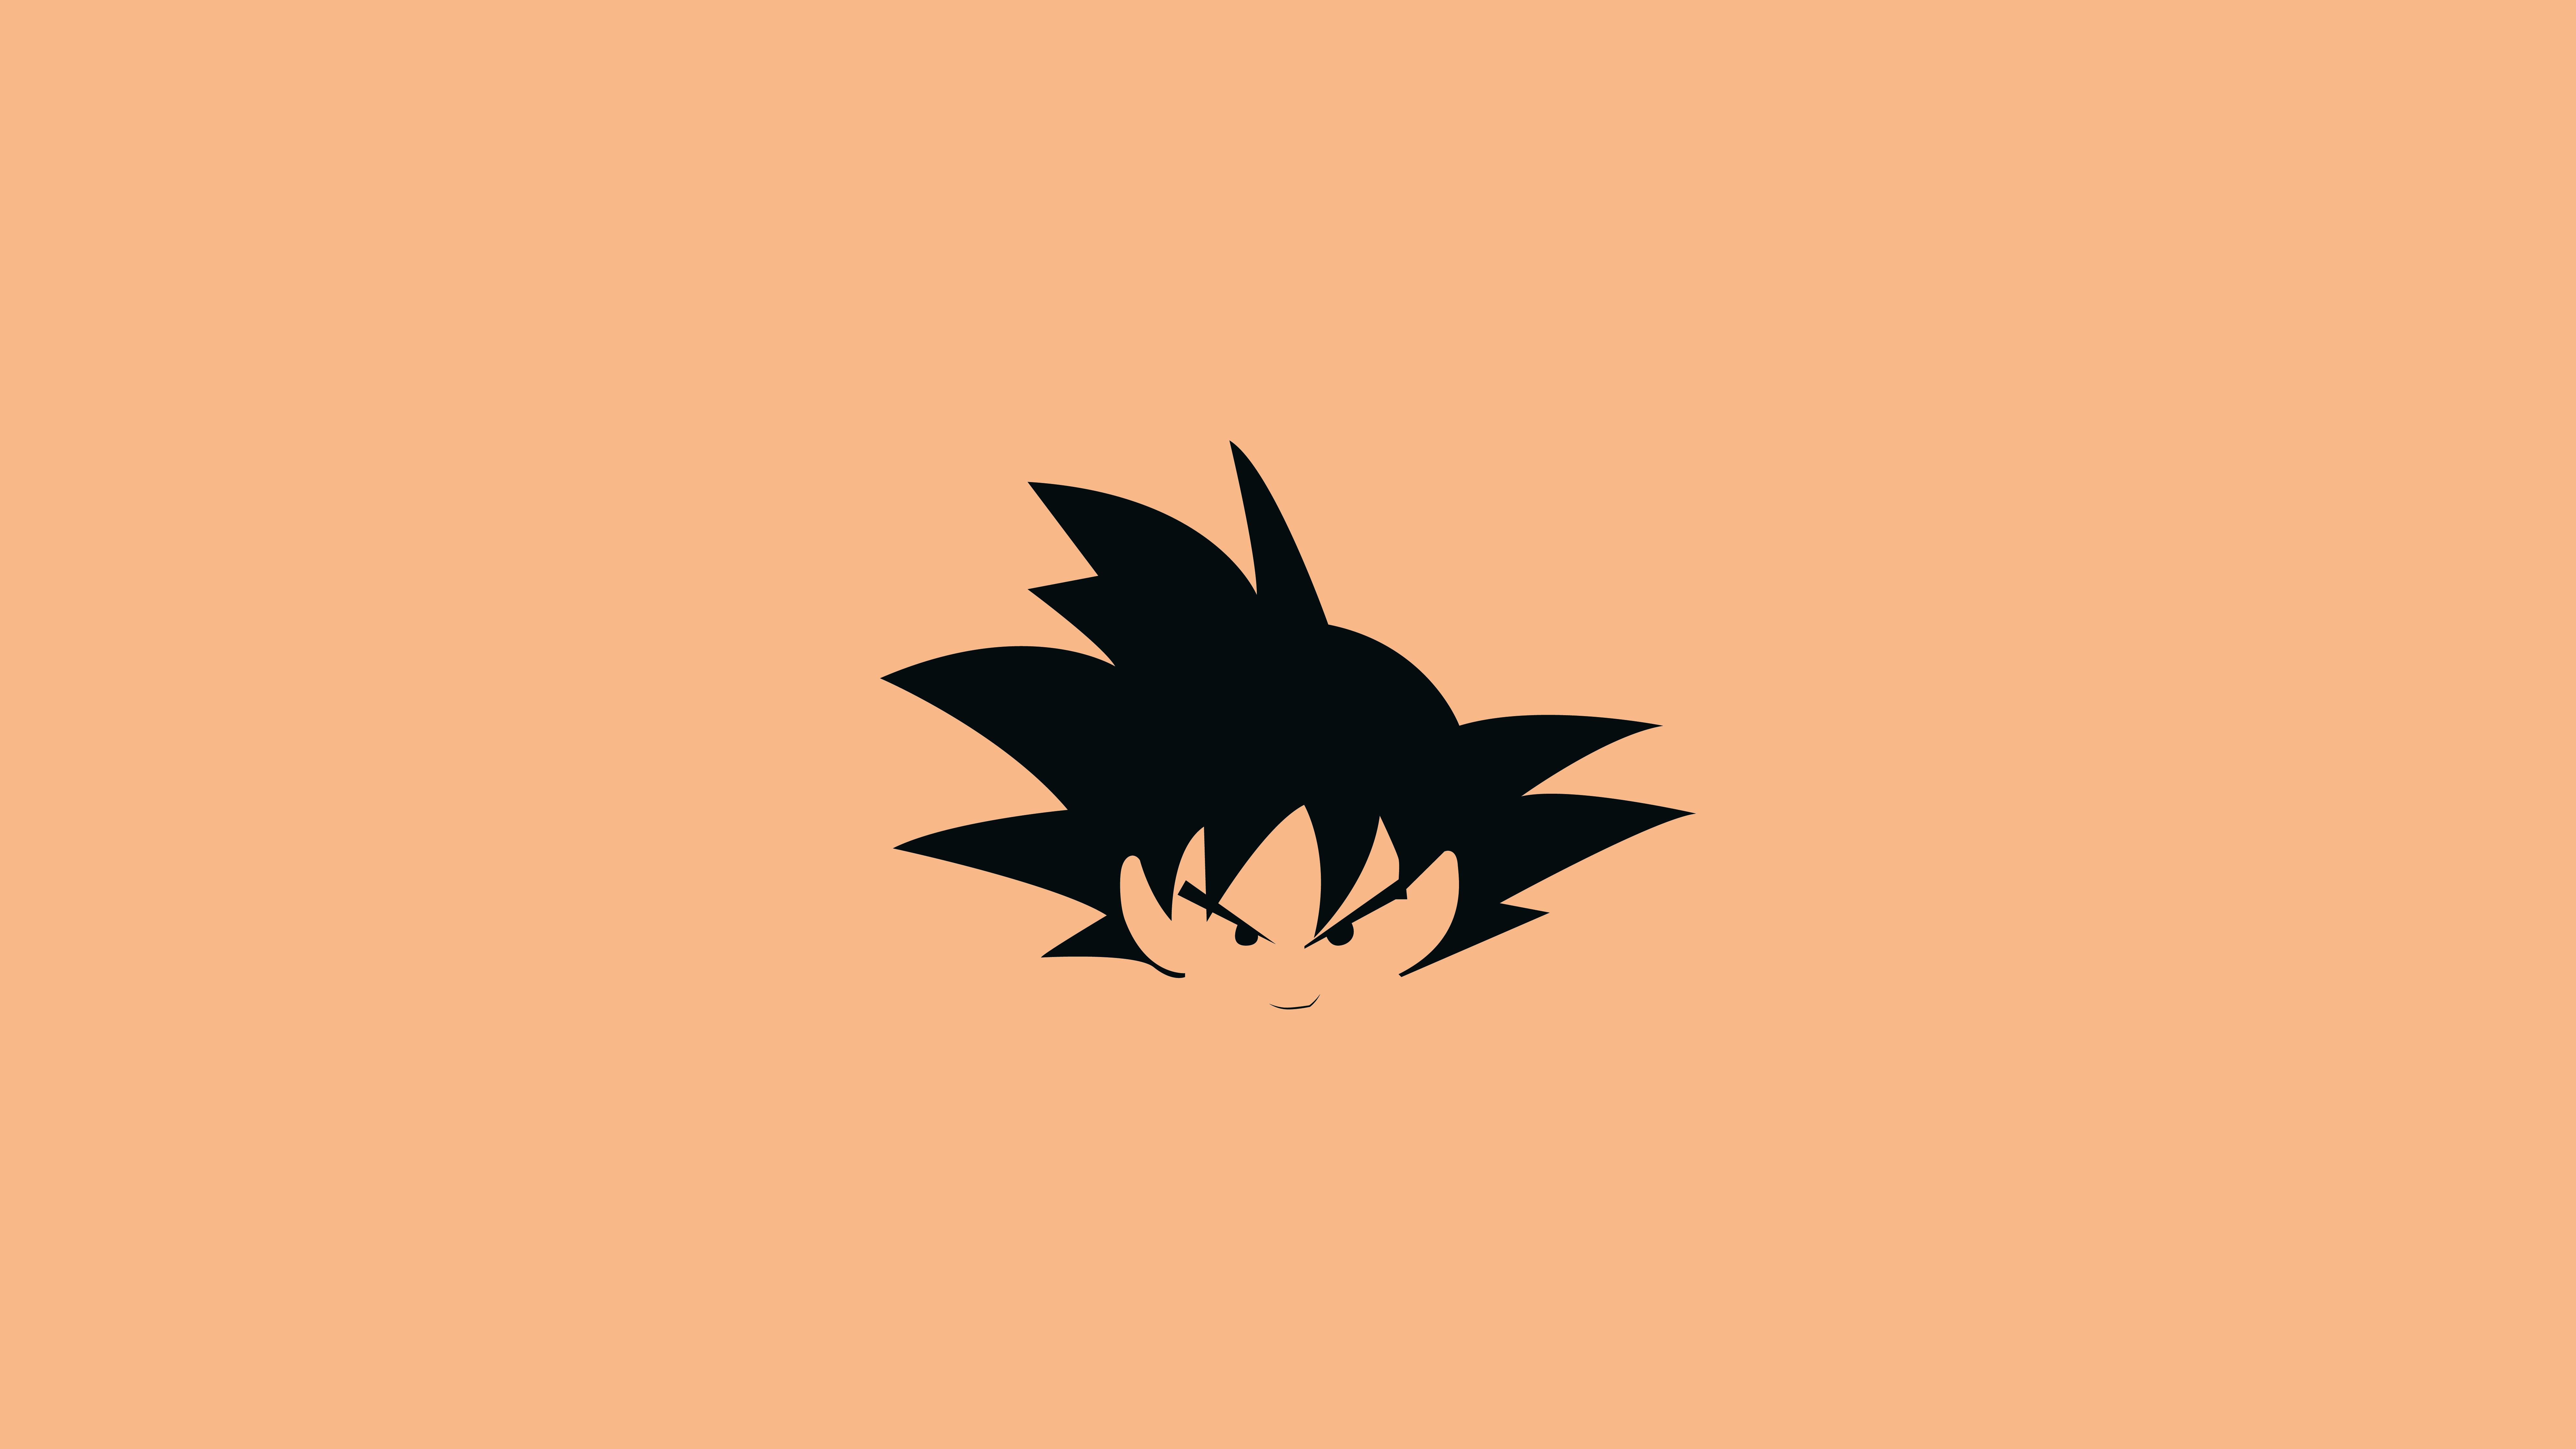 Fondos de pantalla Anime Ilustración minimalista de Goku